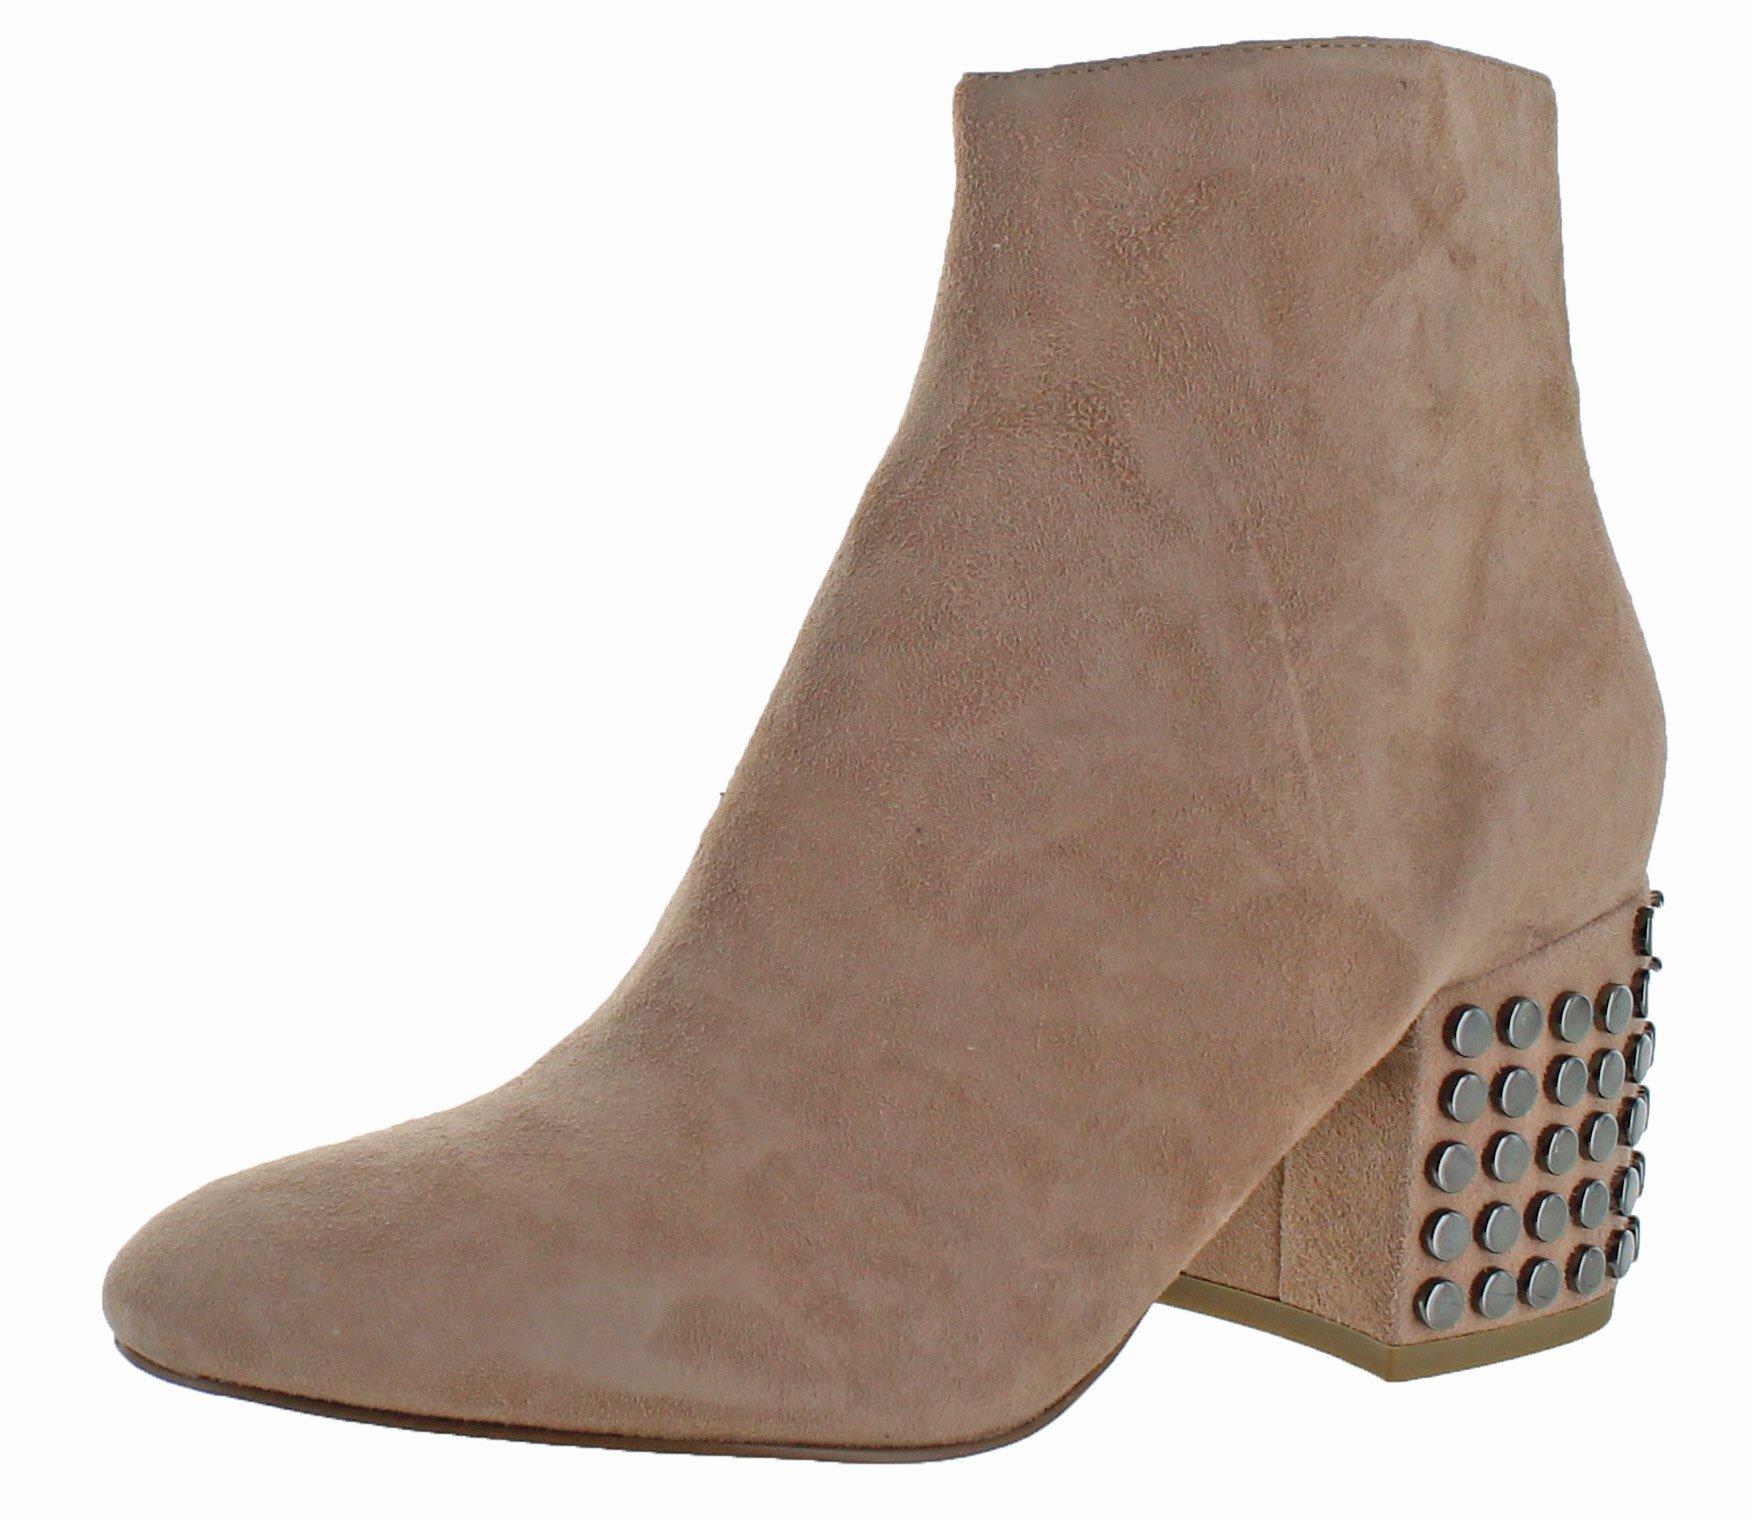 KENDALL + KYLIE Women's Blythe Ankle Boot, Blush, 7.5 Medium US